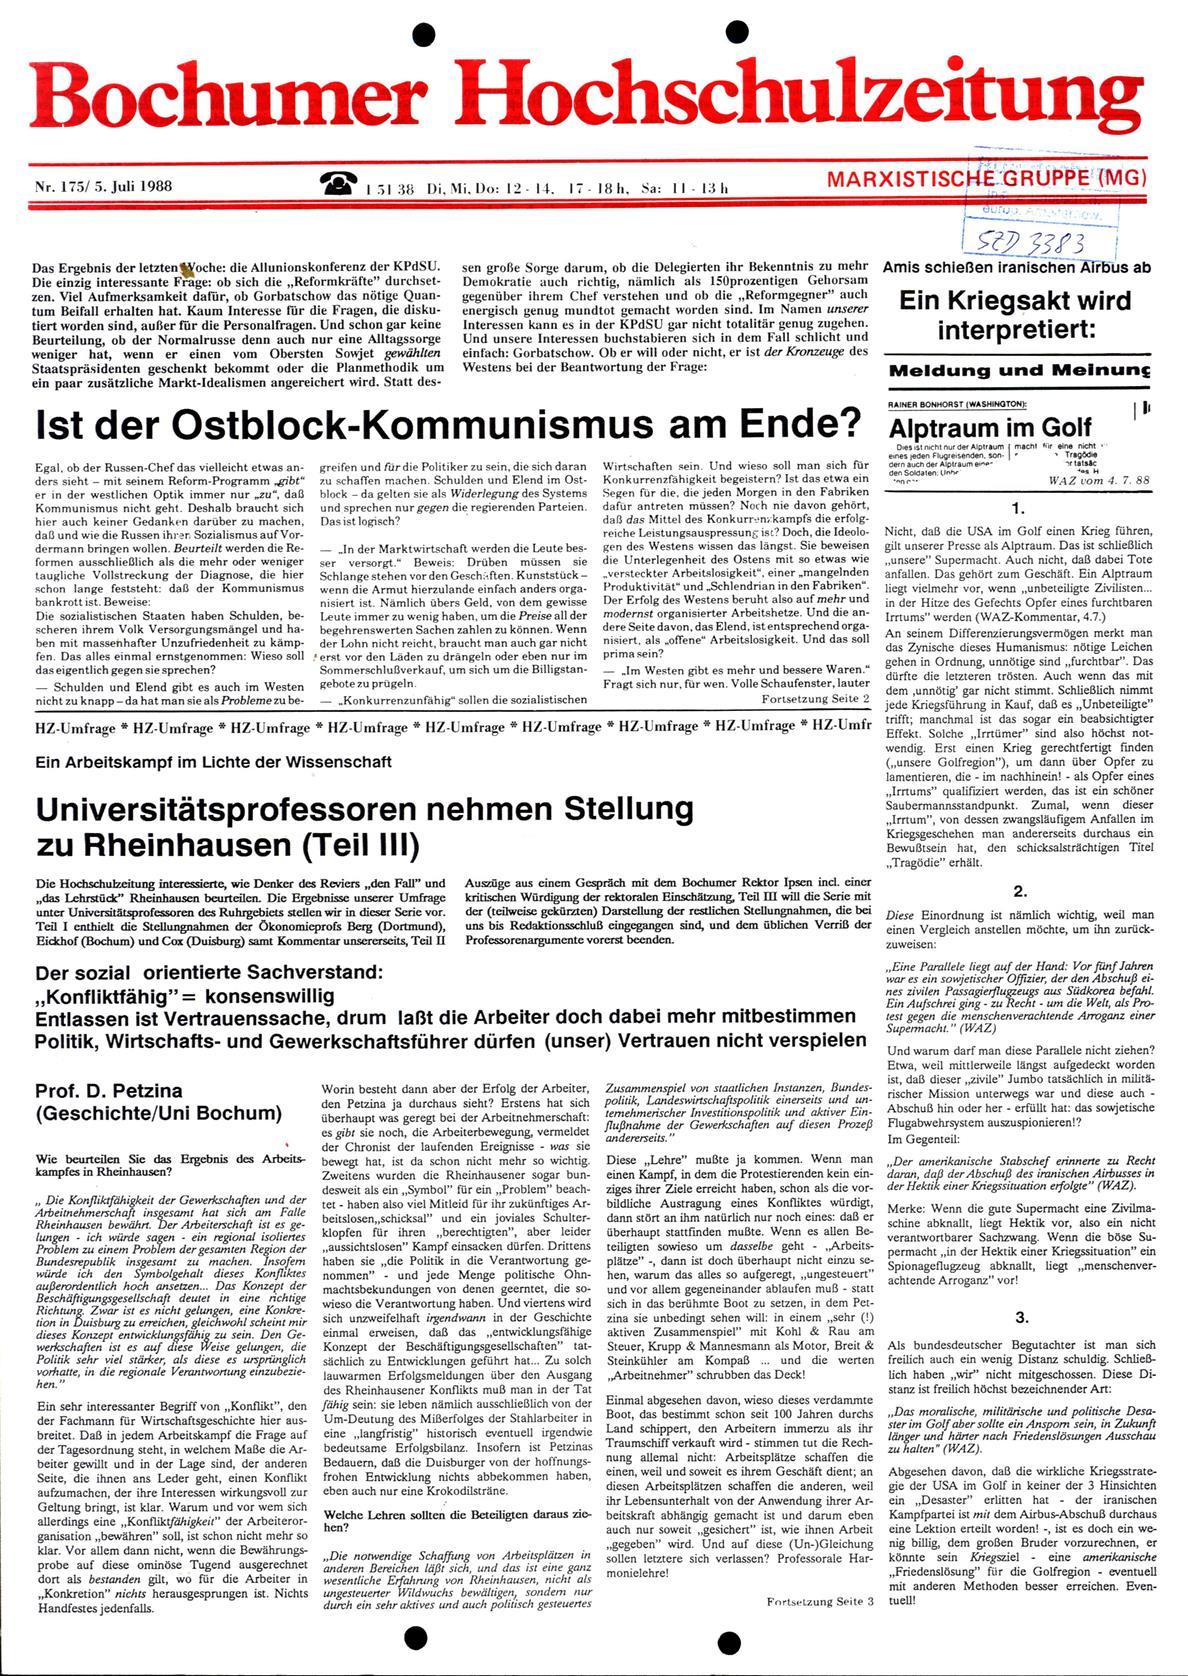 Bochum_BHZ_19880705_175_001